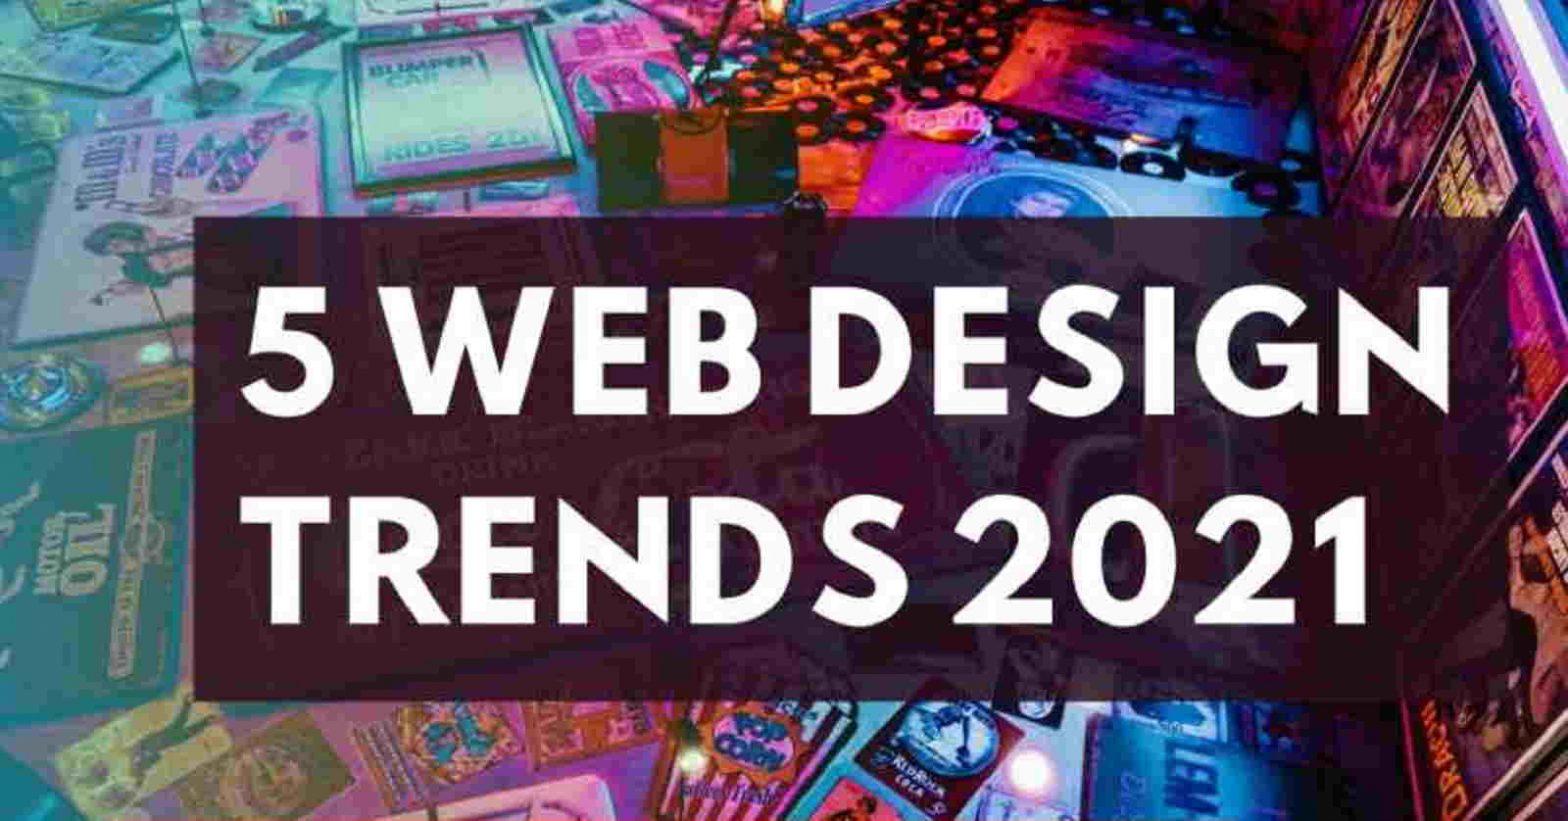 5 Web Design Trends Of 2021 You Should Consider For Your Website